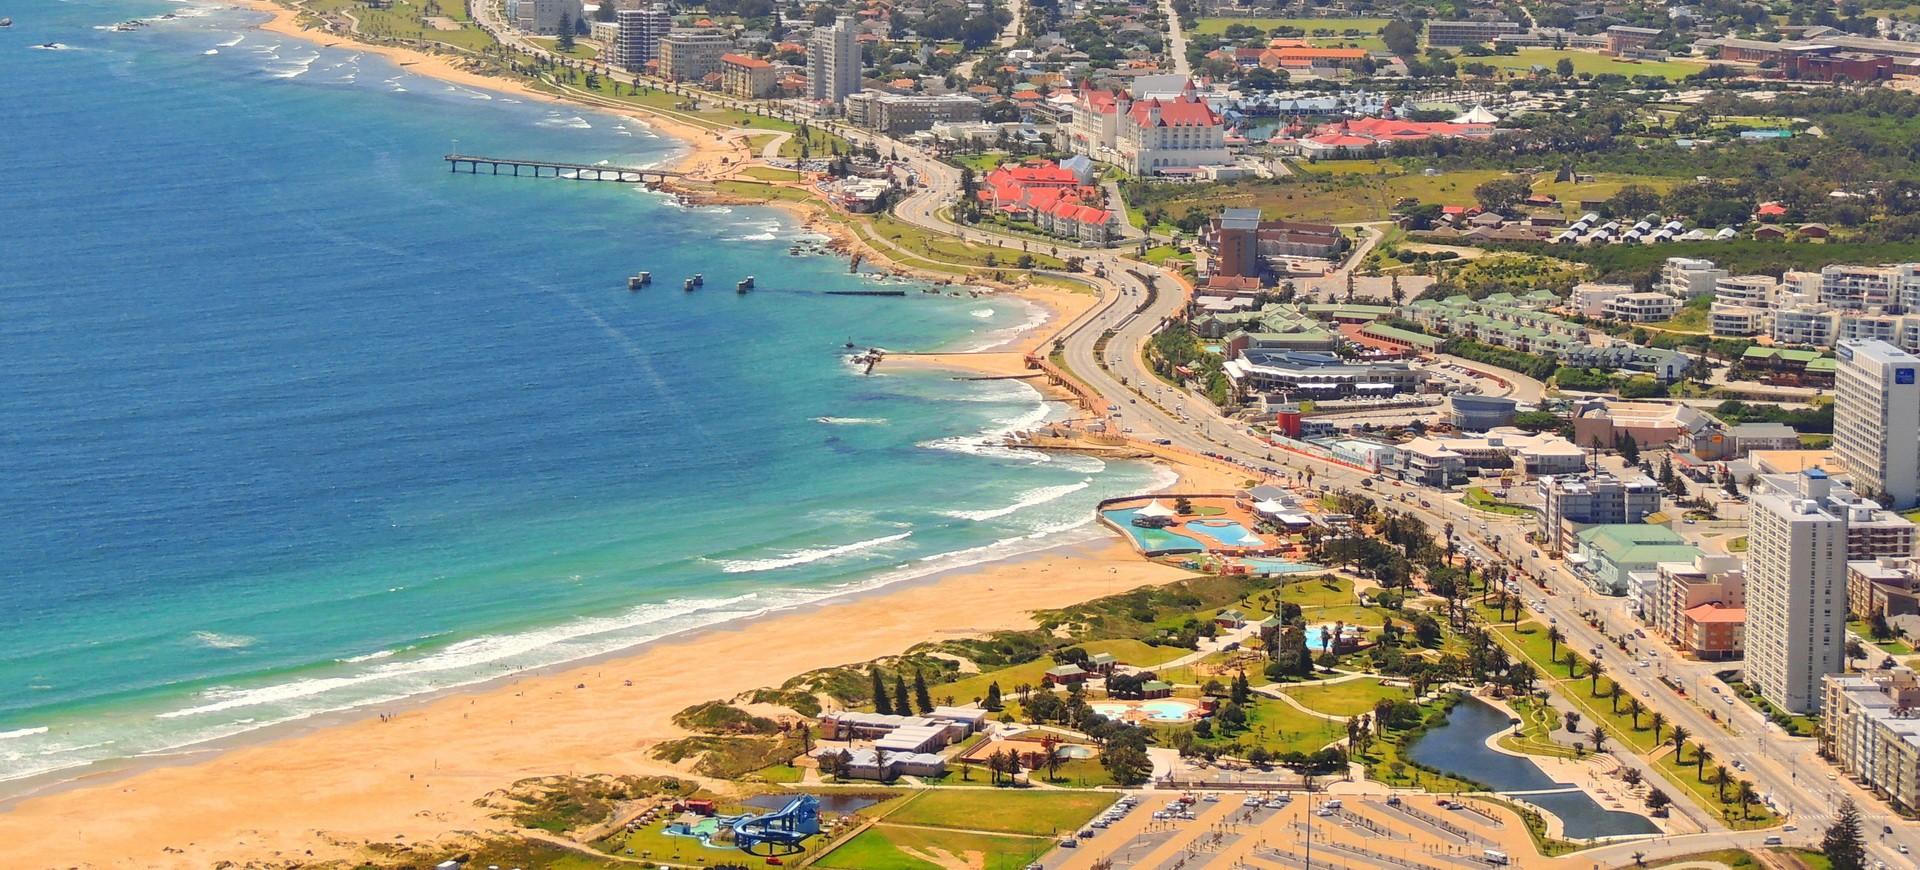 Afrique du Sud Port Elizabeth 002